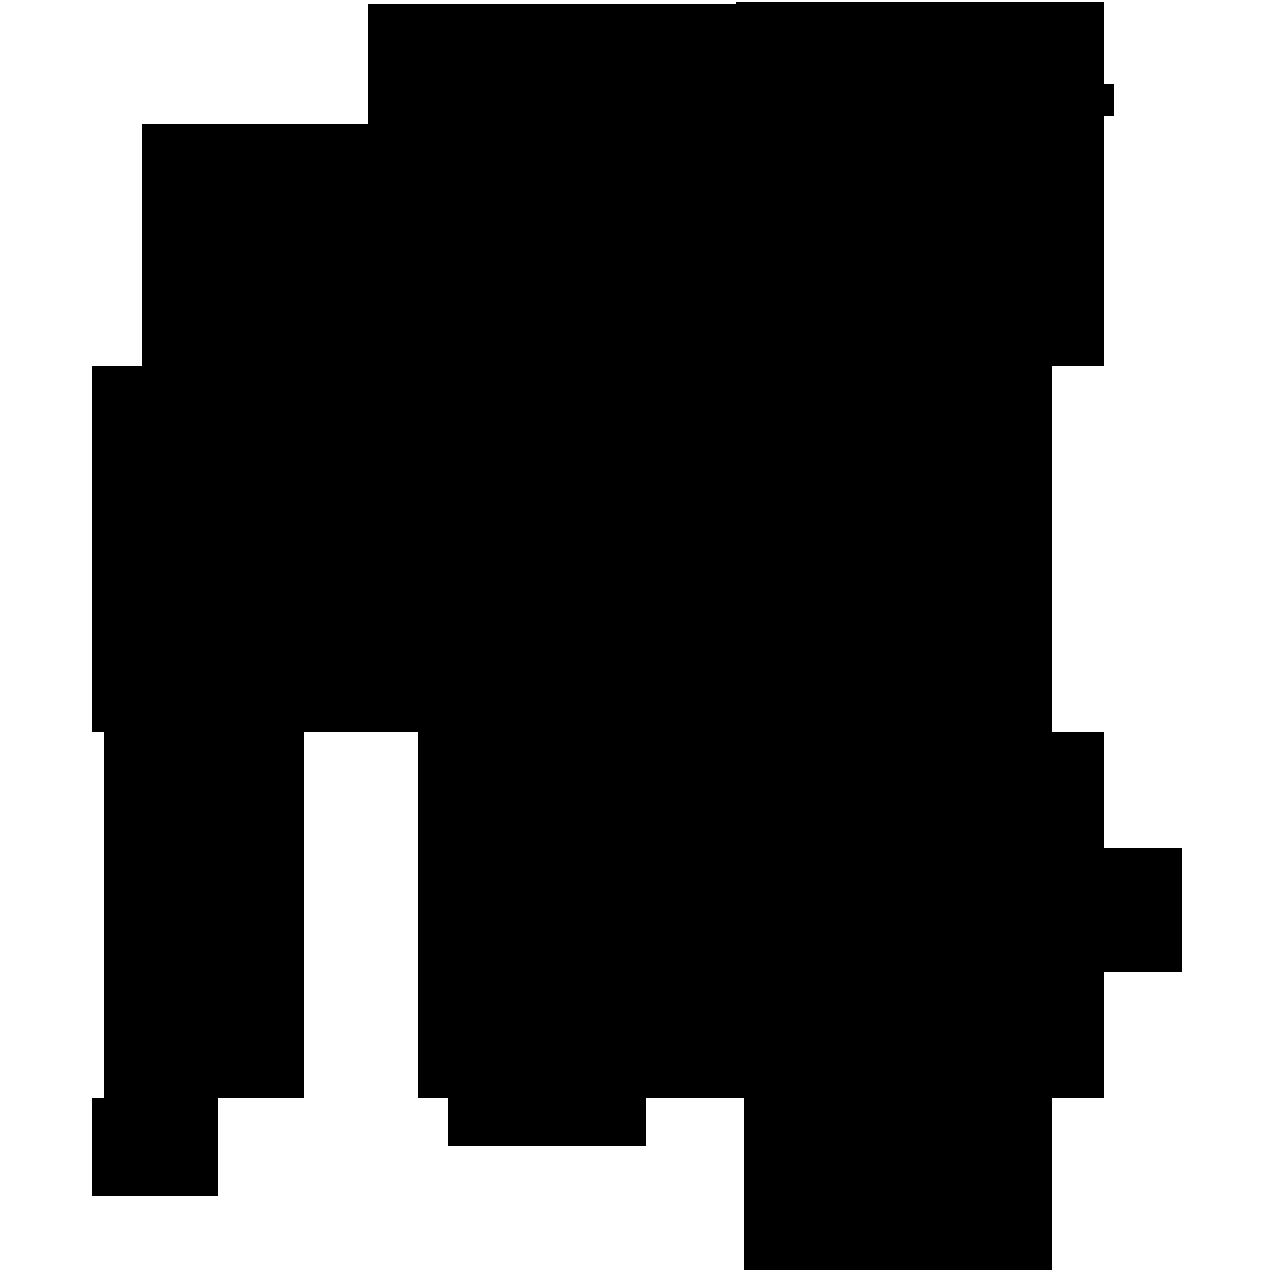 Helmet clip art. Greek clipart logo